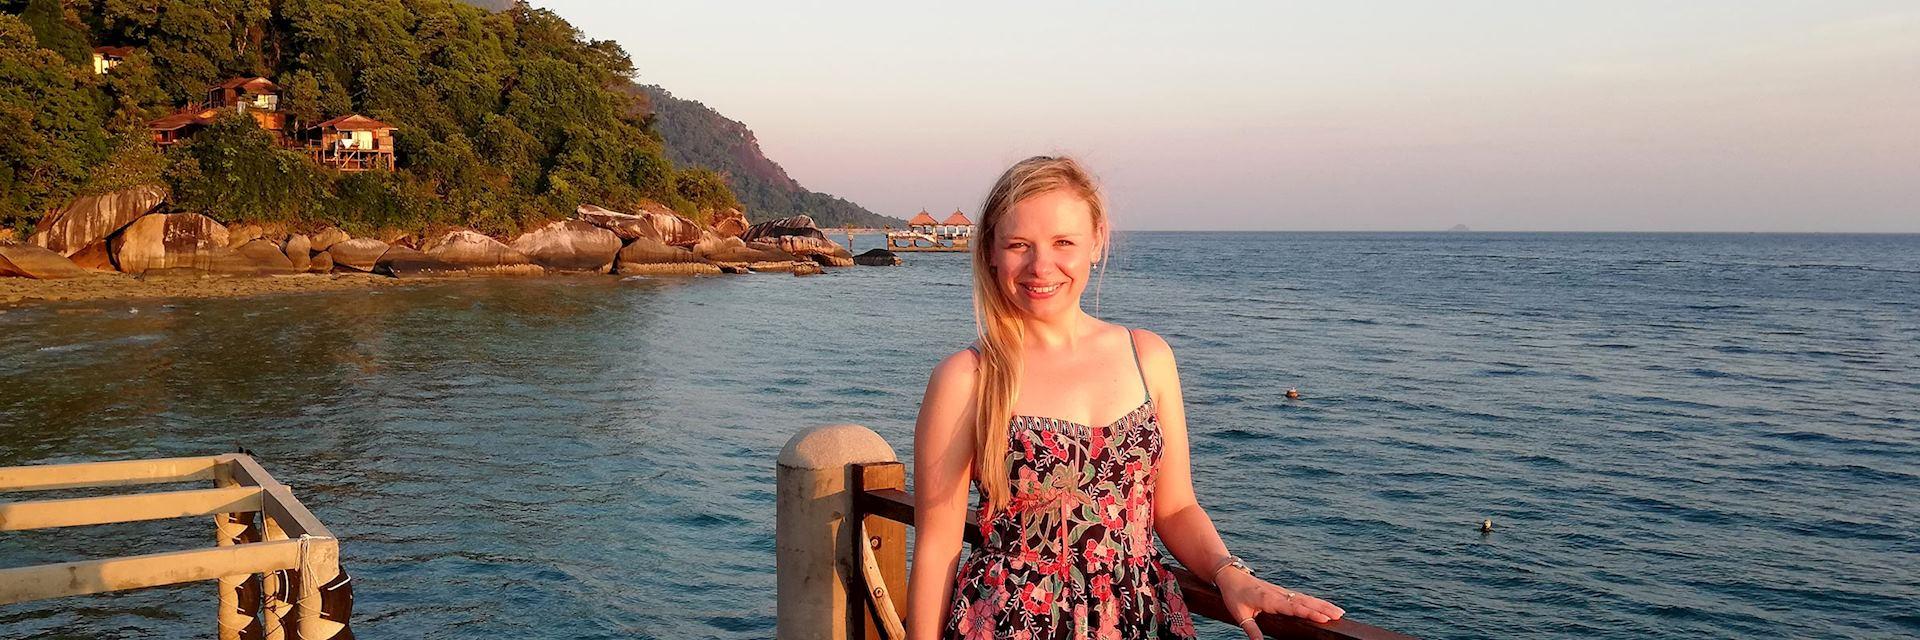 Emma visiting Tioman Island, Malaysia